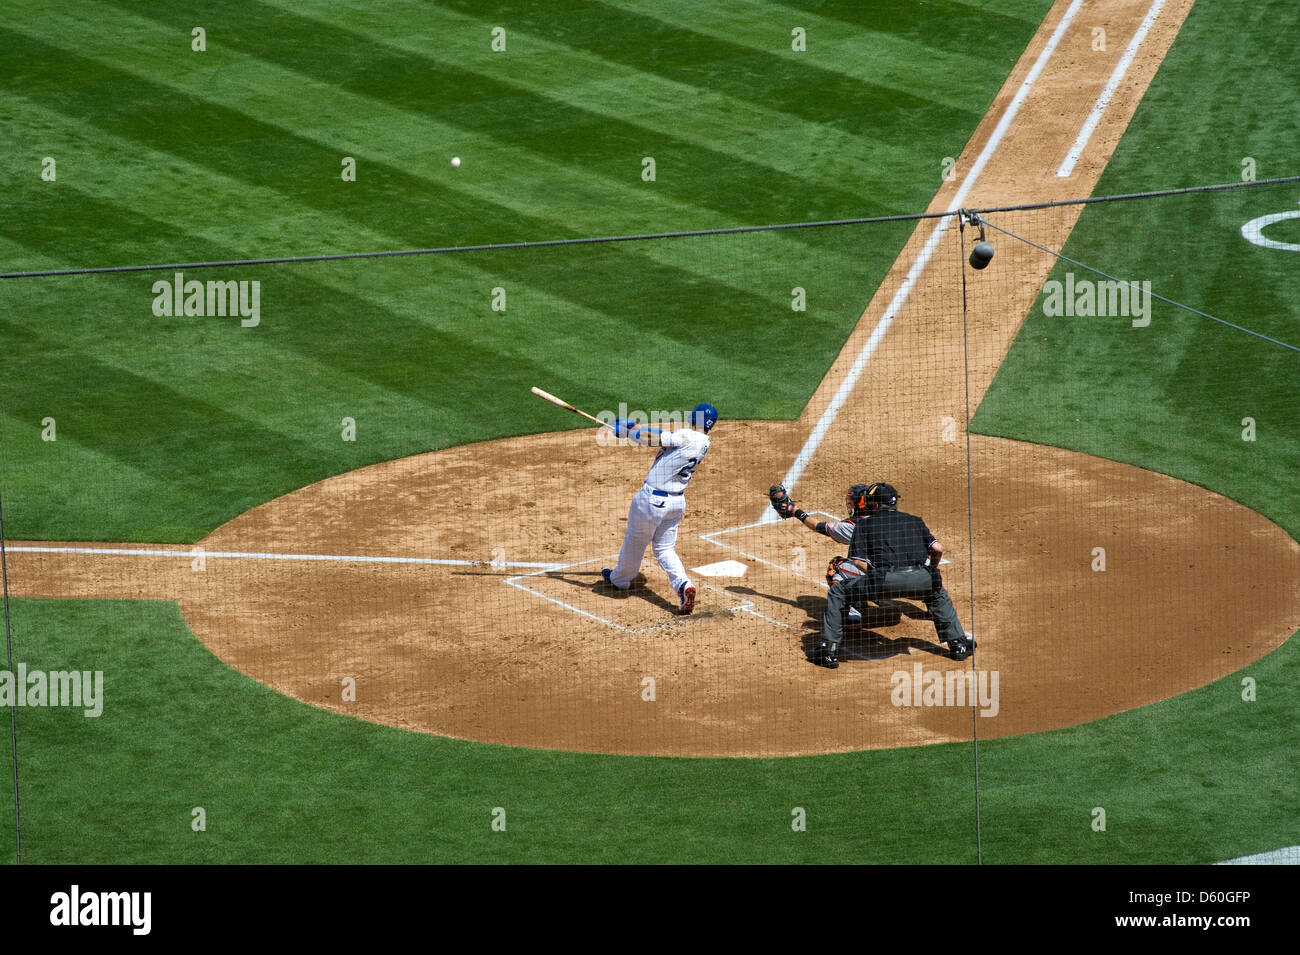 Baseball Umpire Stock Photos & Baseball Umpire Stock Images